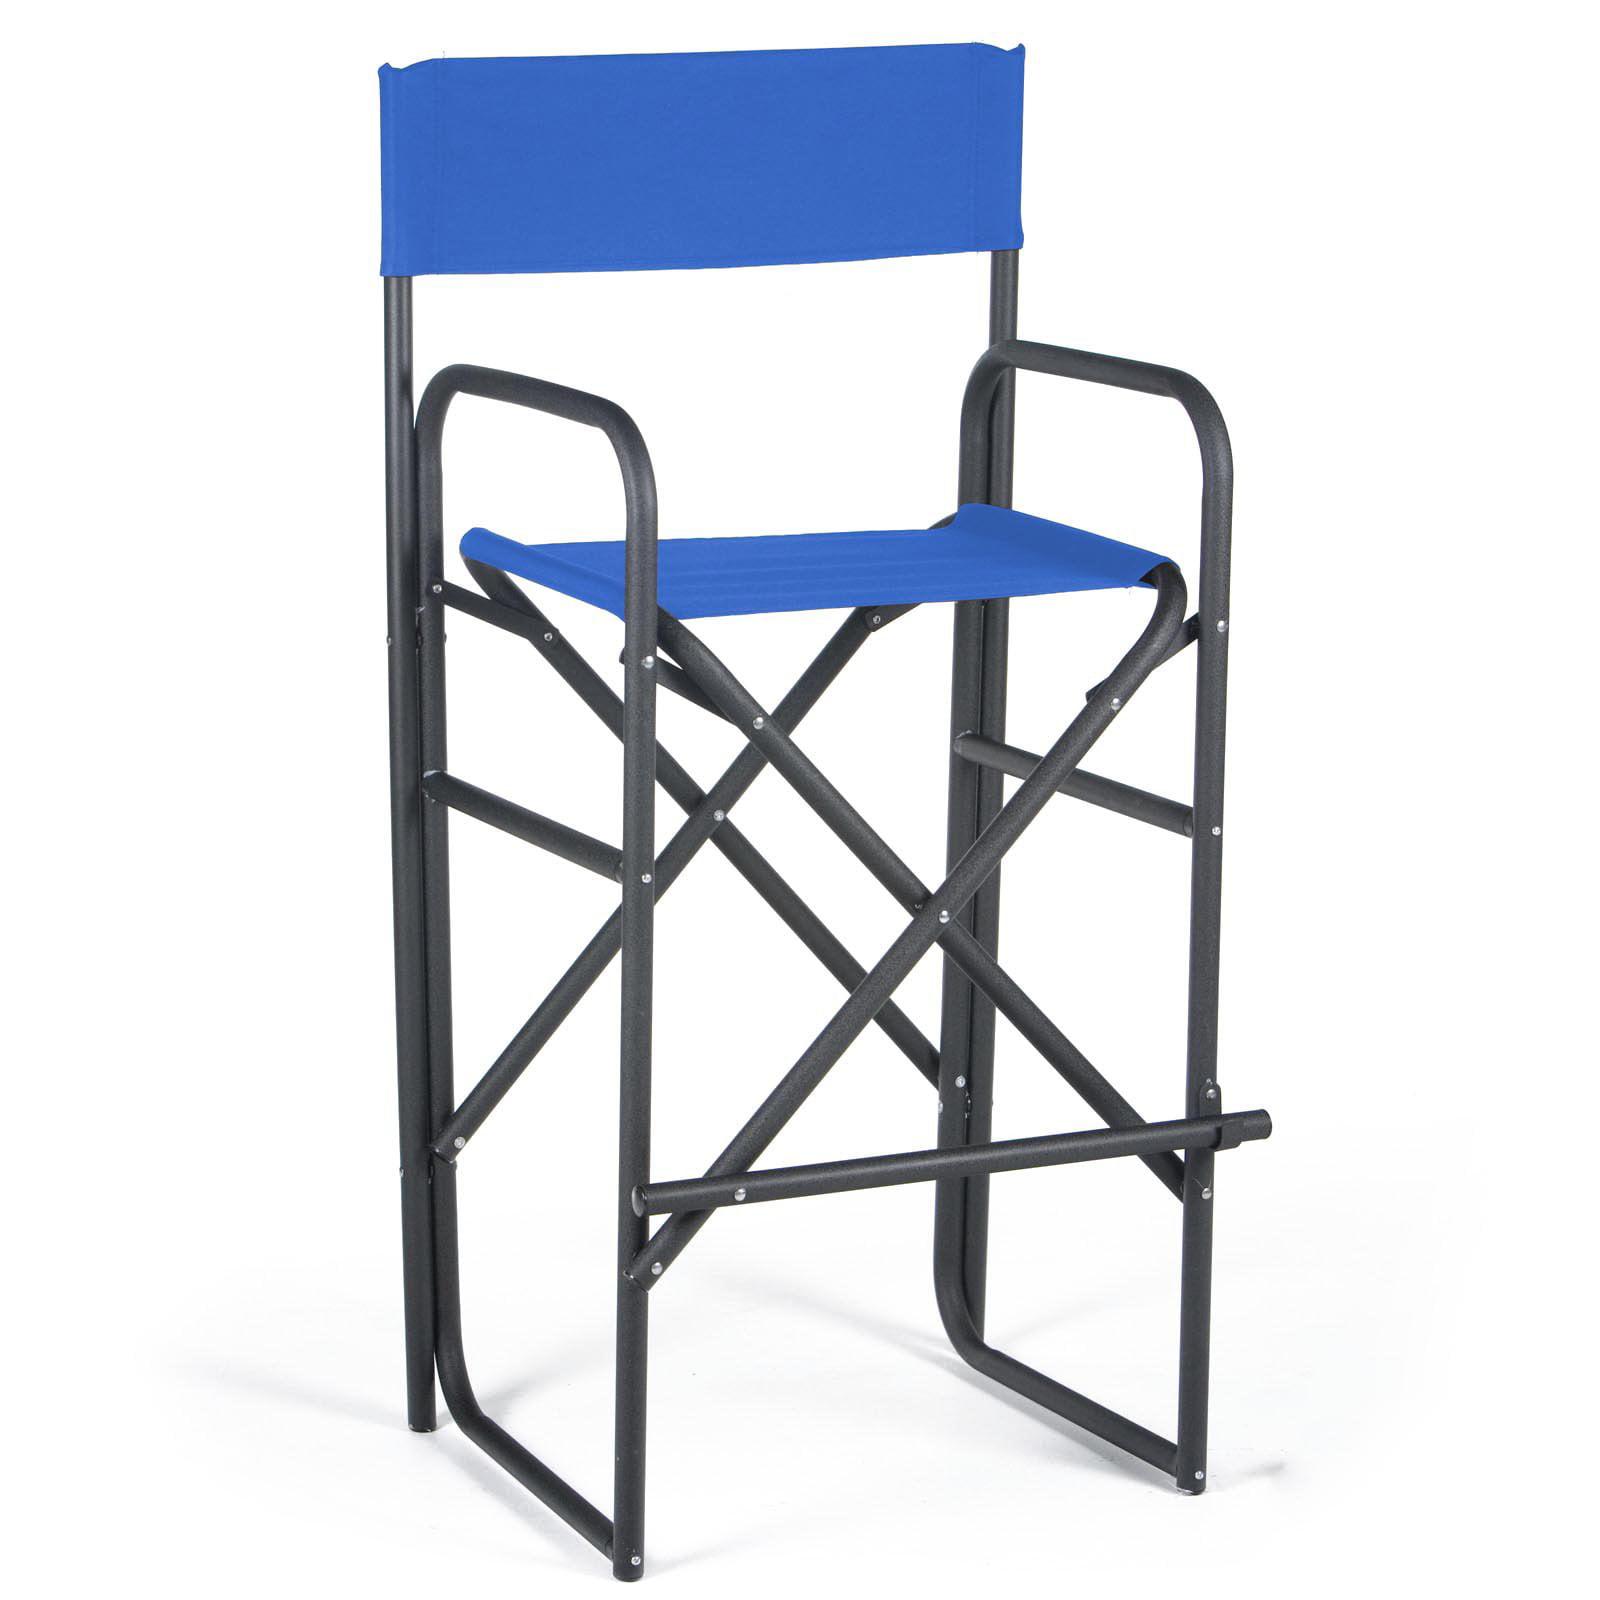 30.5 Inch Black Frame Bar Height Directors Chair